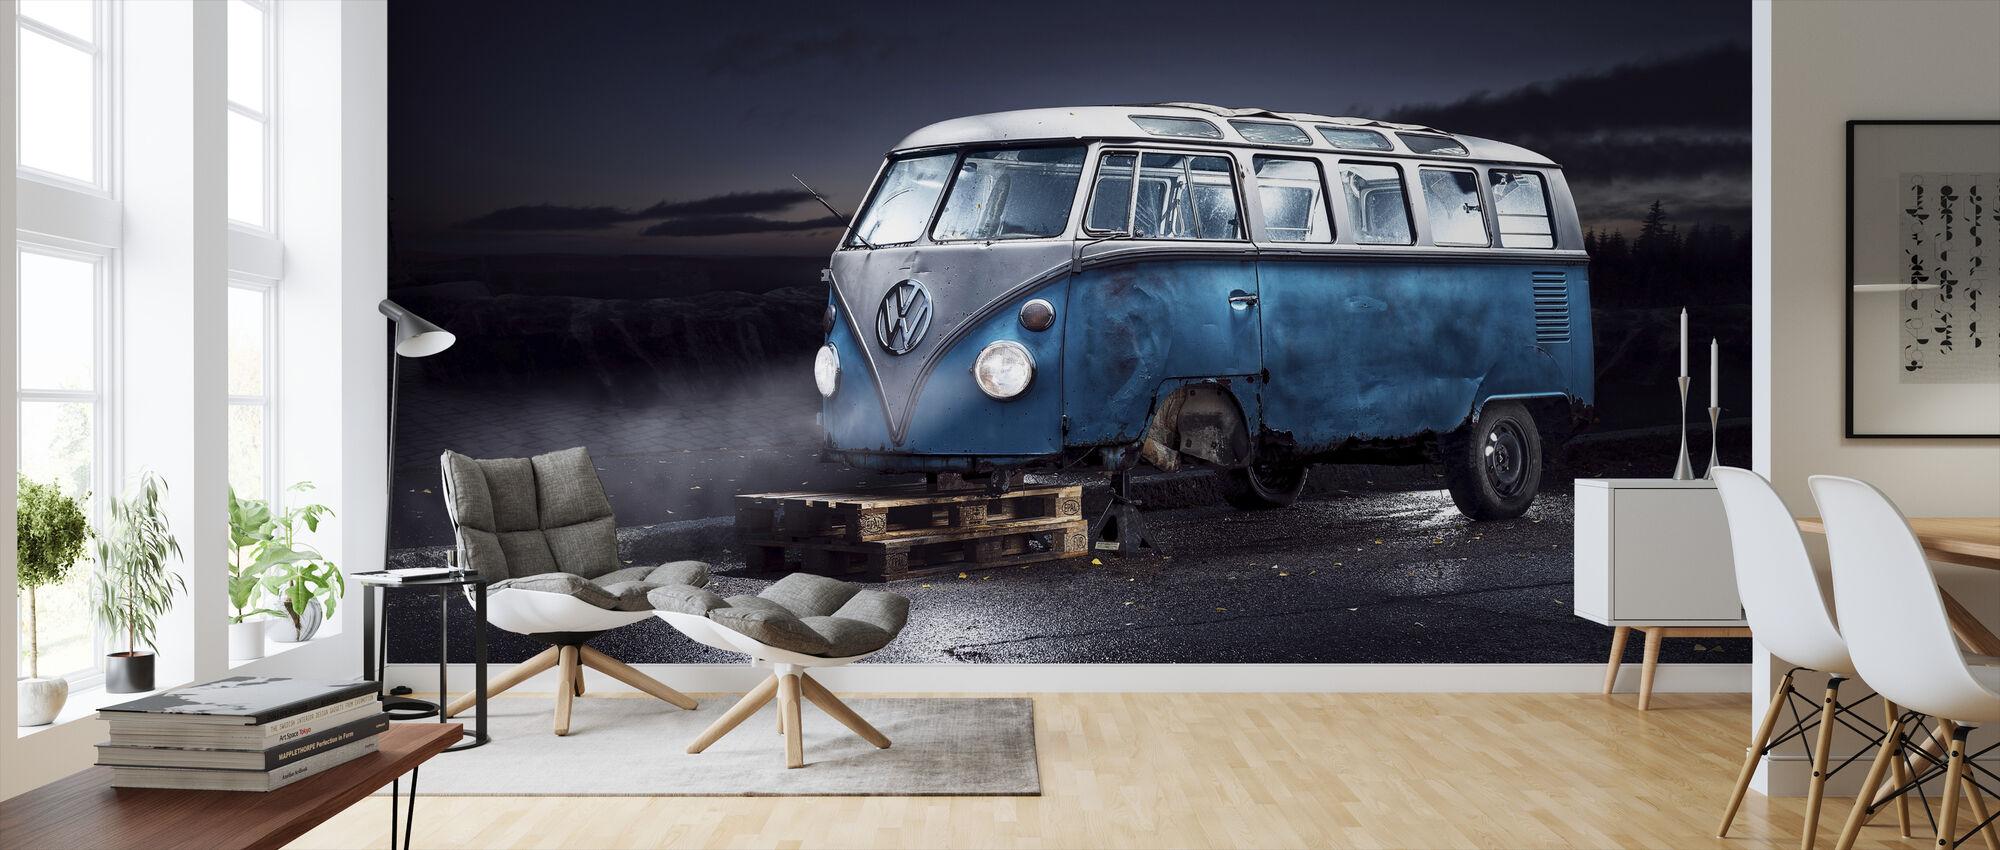 VW minibus - Wallpaper - Living Room